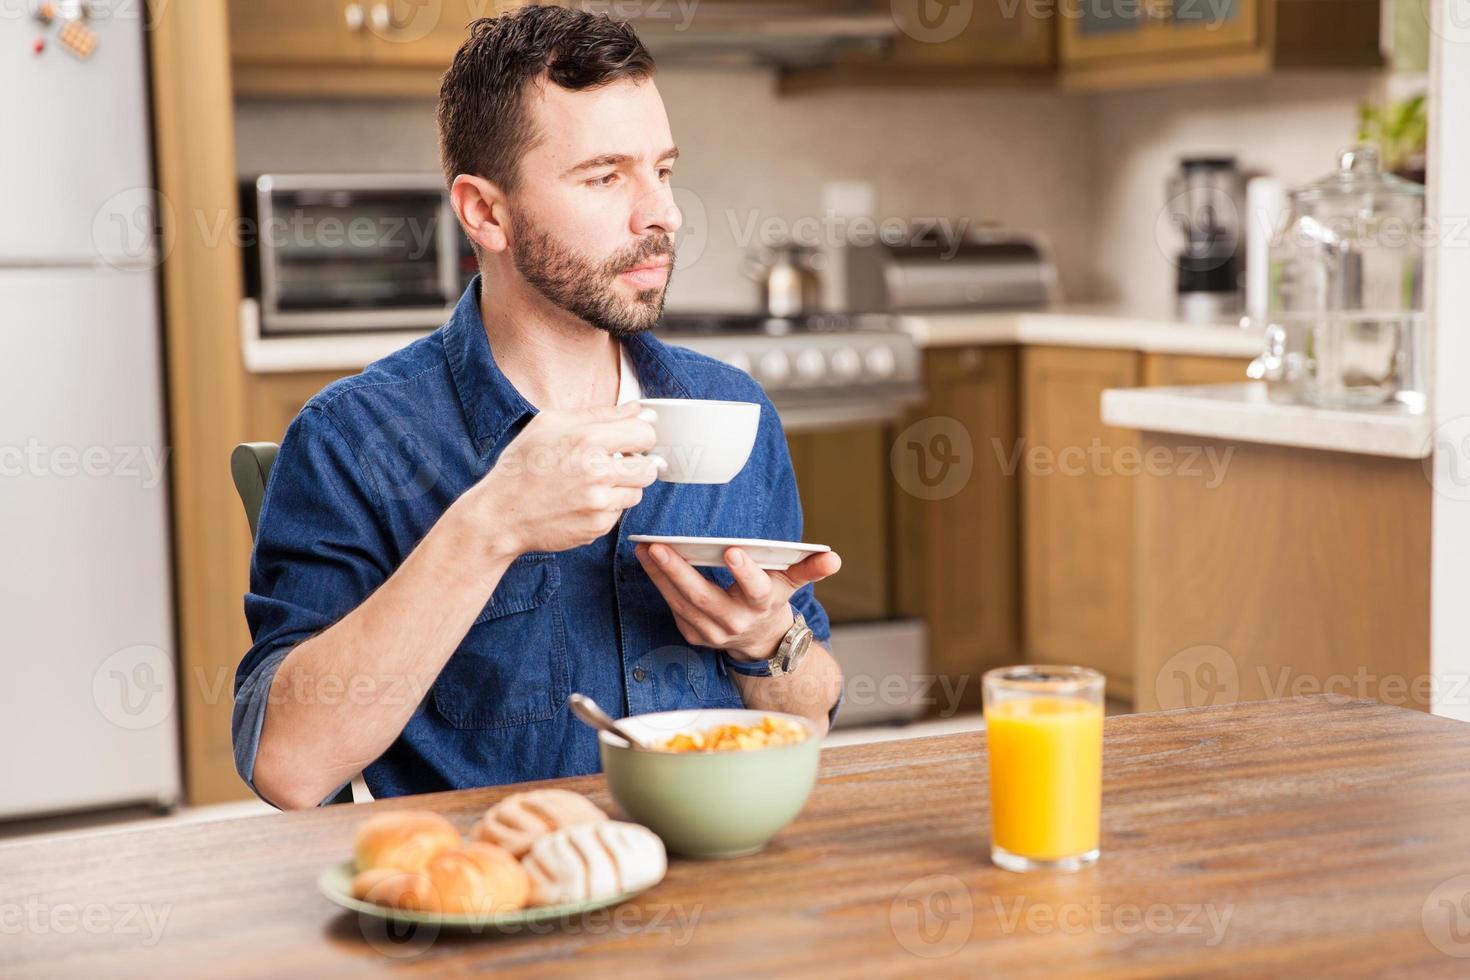 Mann genießt Kaffee zum Frühstück foto